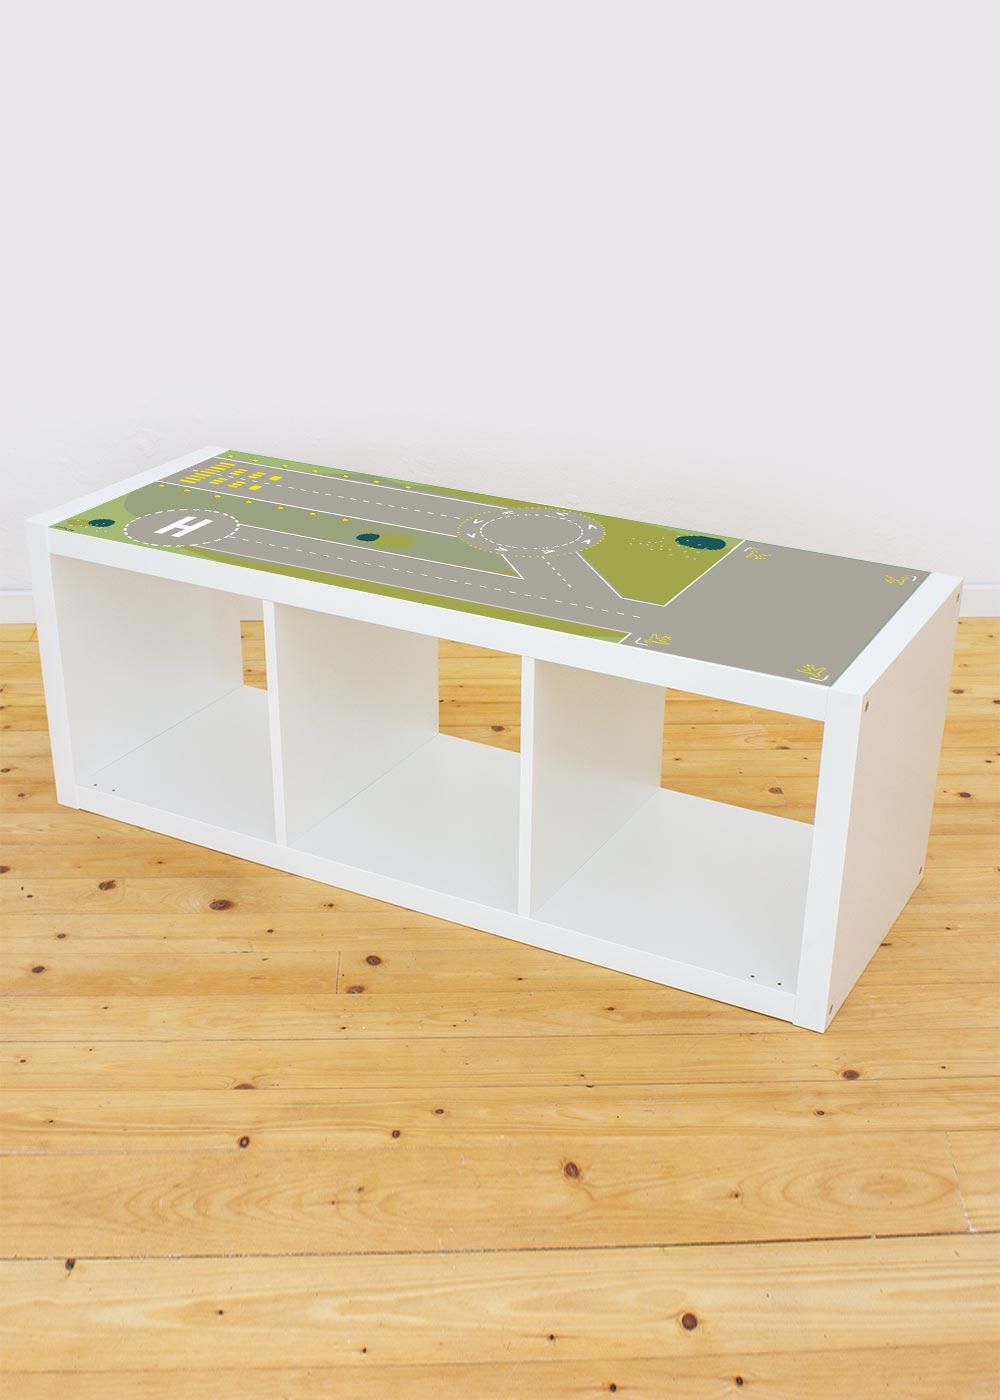 Ikea Kallax Regal Landebahn 3fach Komplettansicht